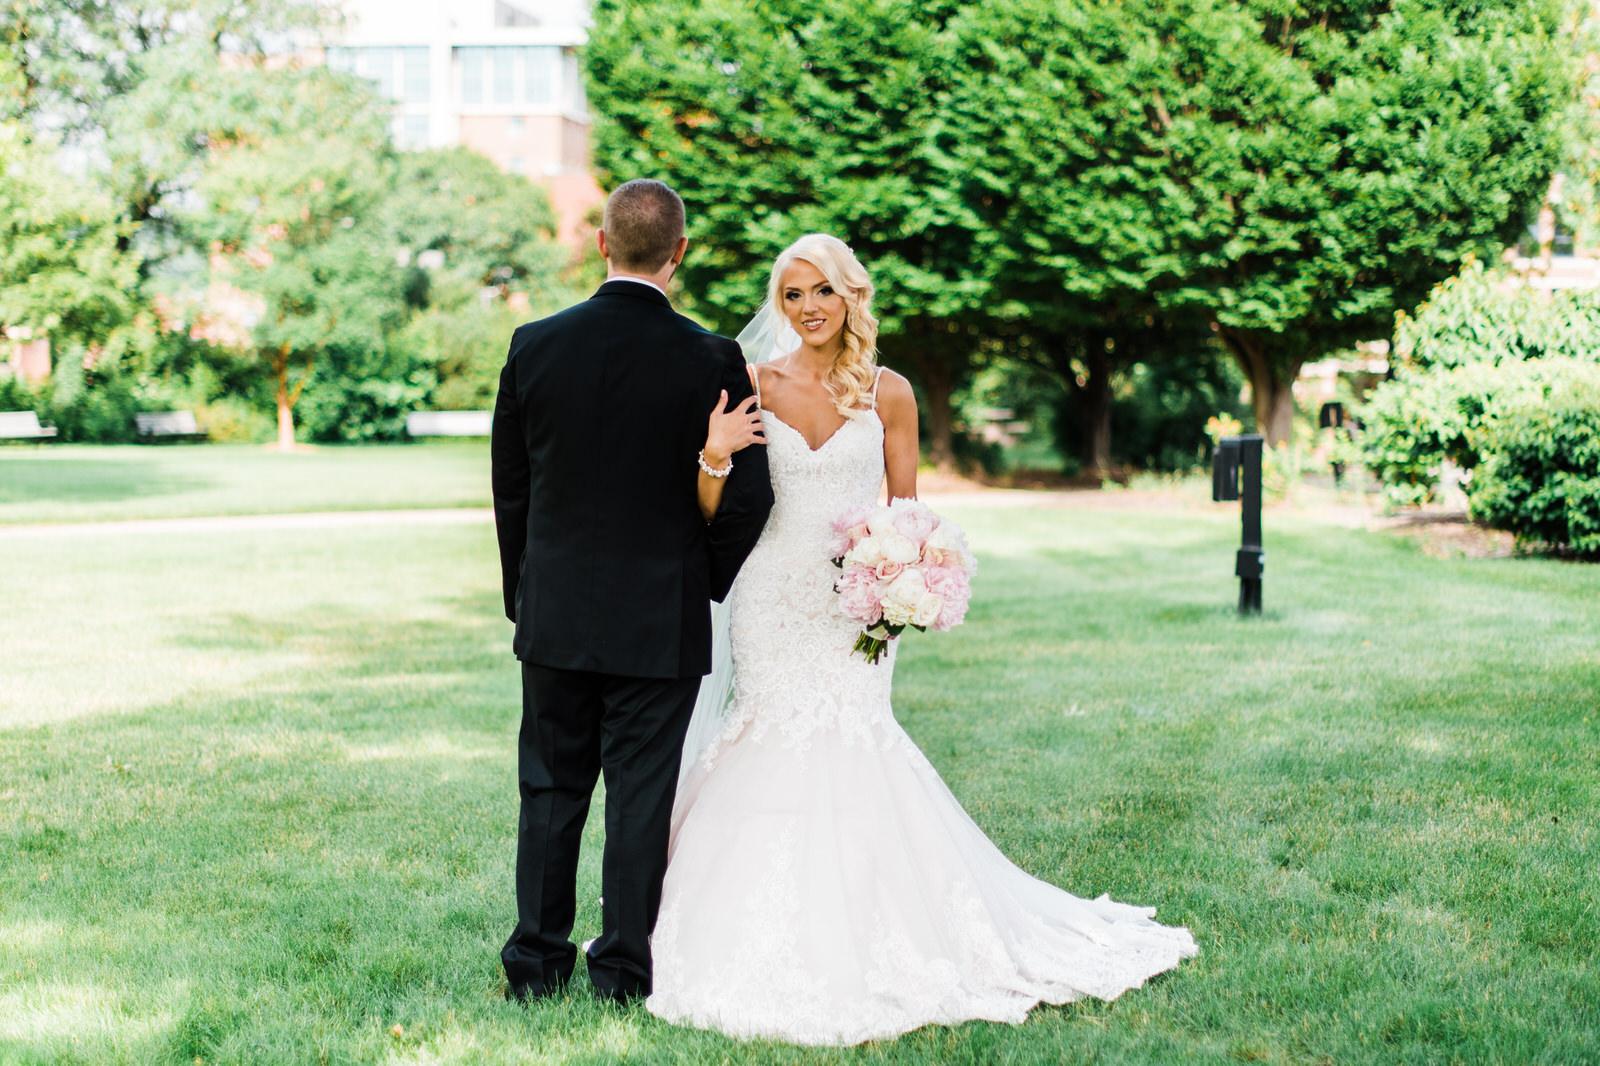 Pittsburgh-Duquesne-University-Wedding-060.jpg